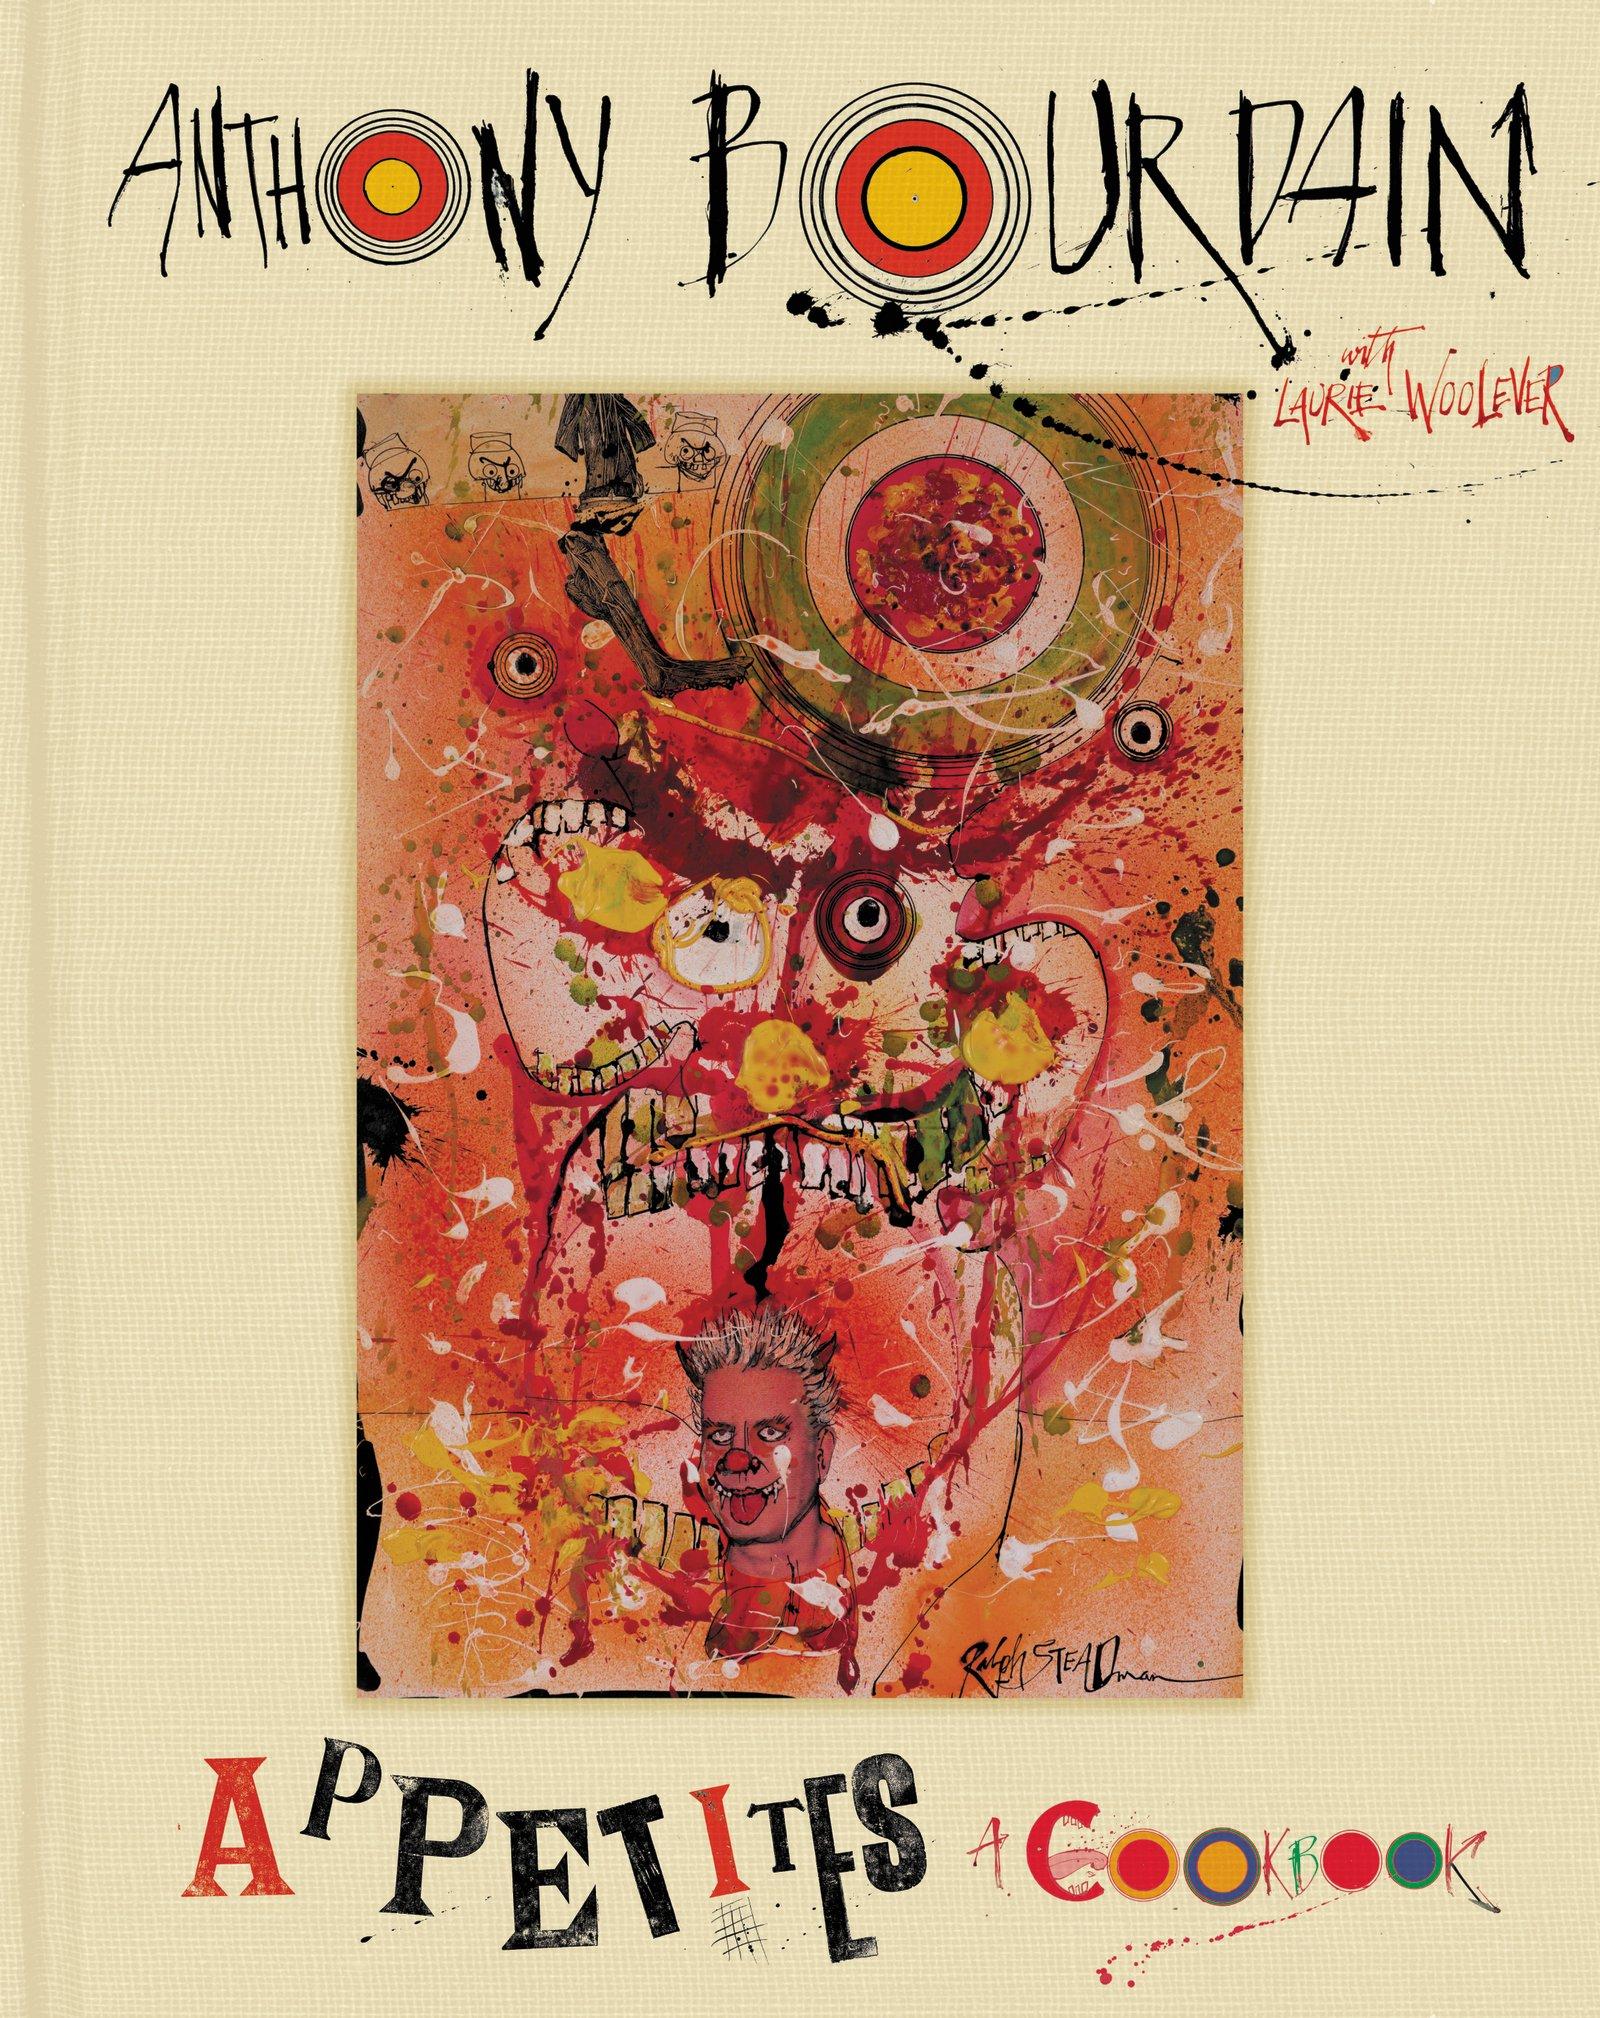 Appetites Cookbook Anthony Bourdain product image